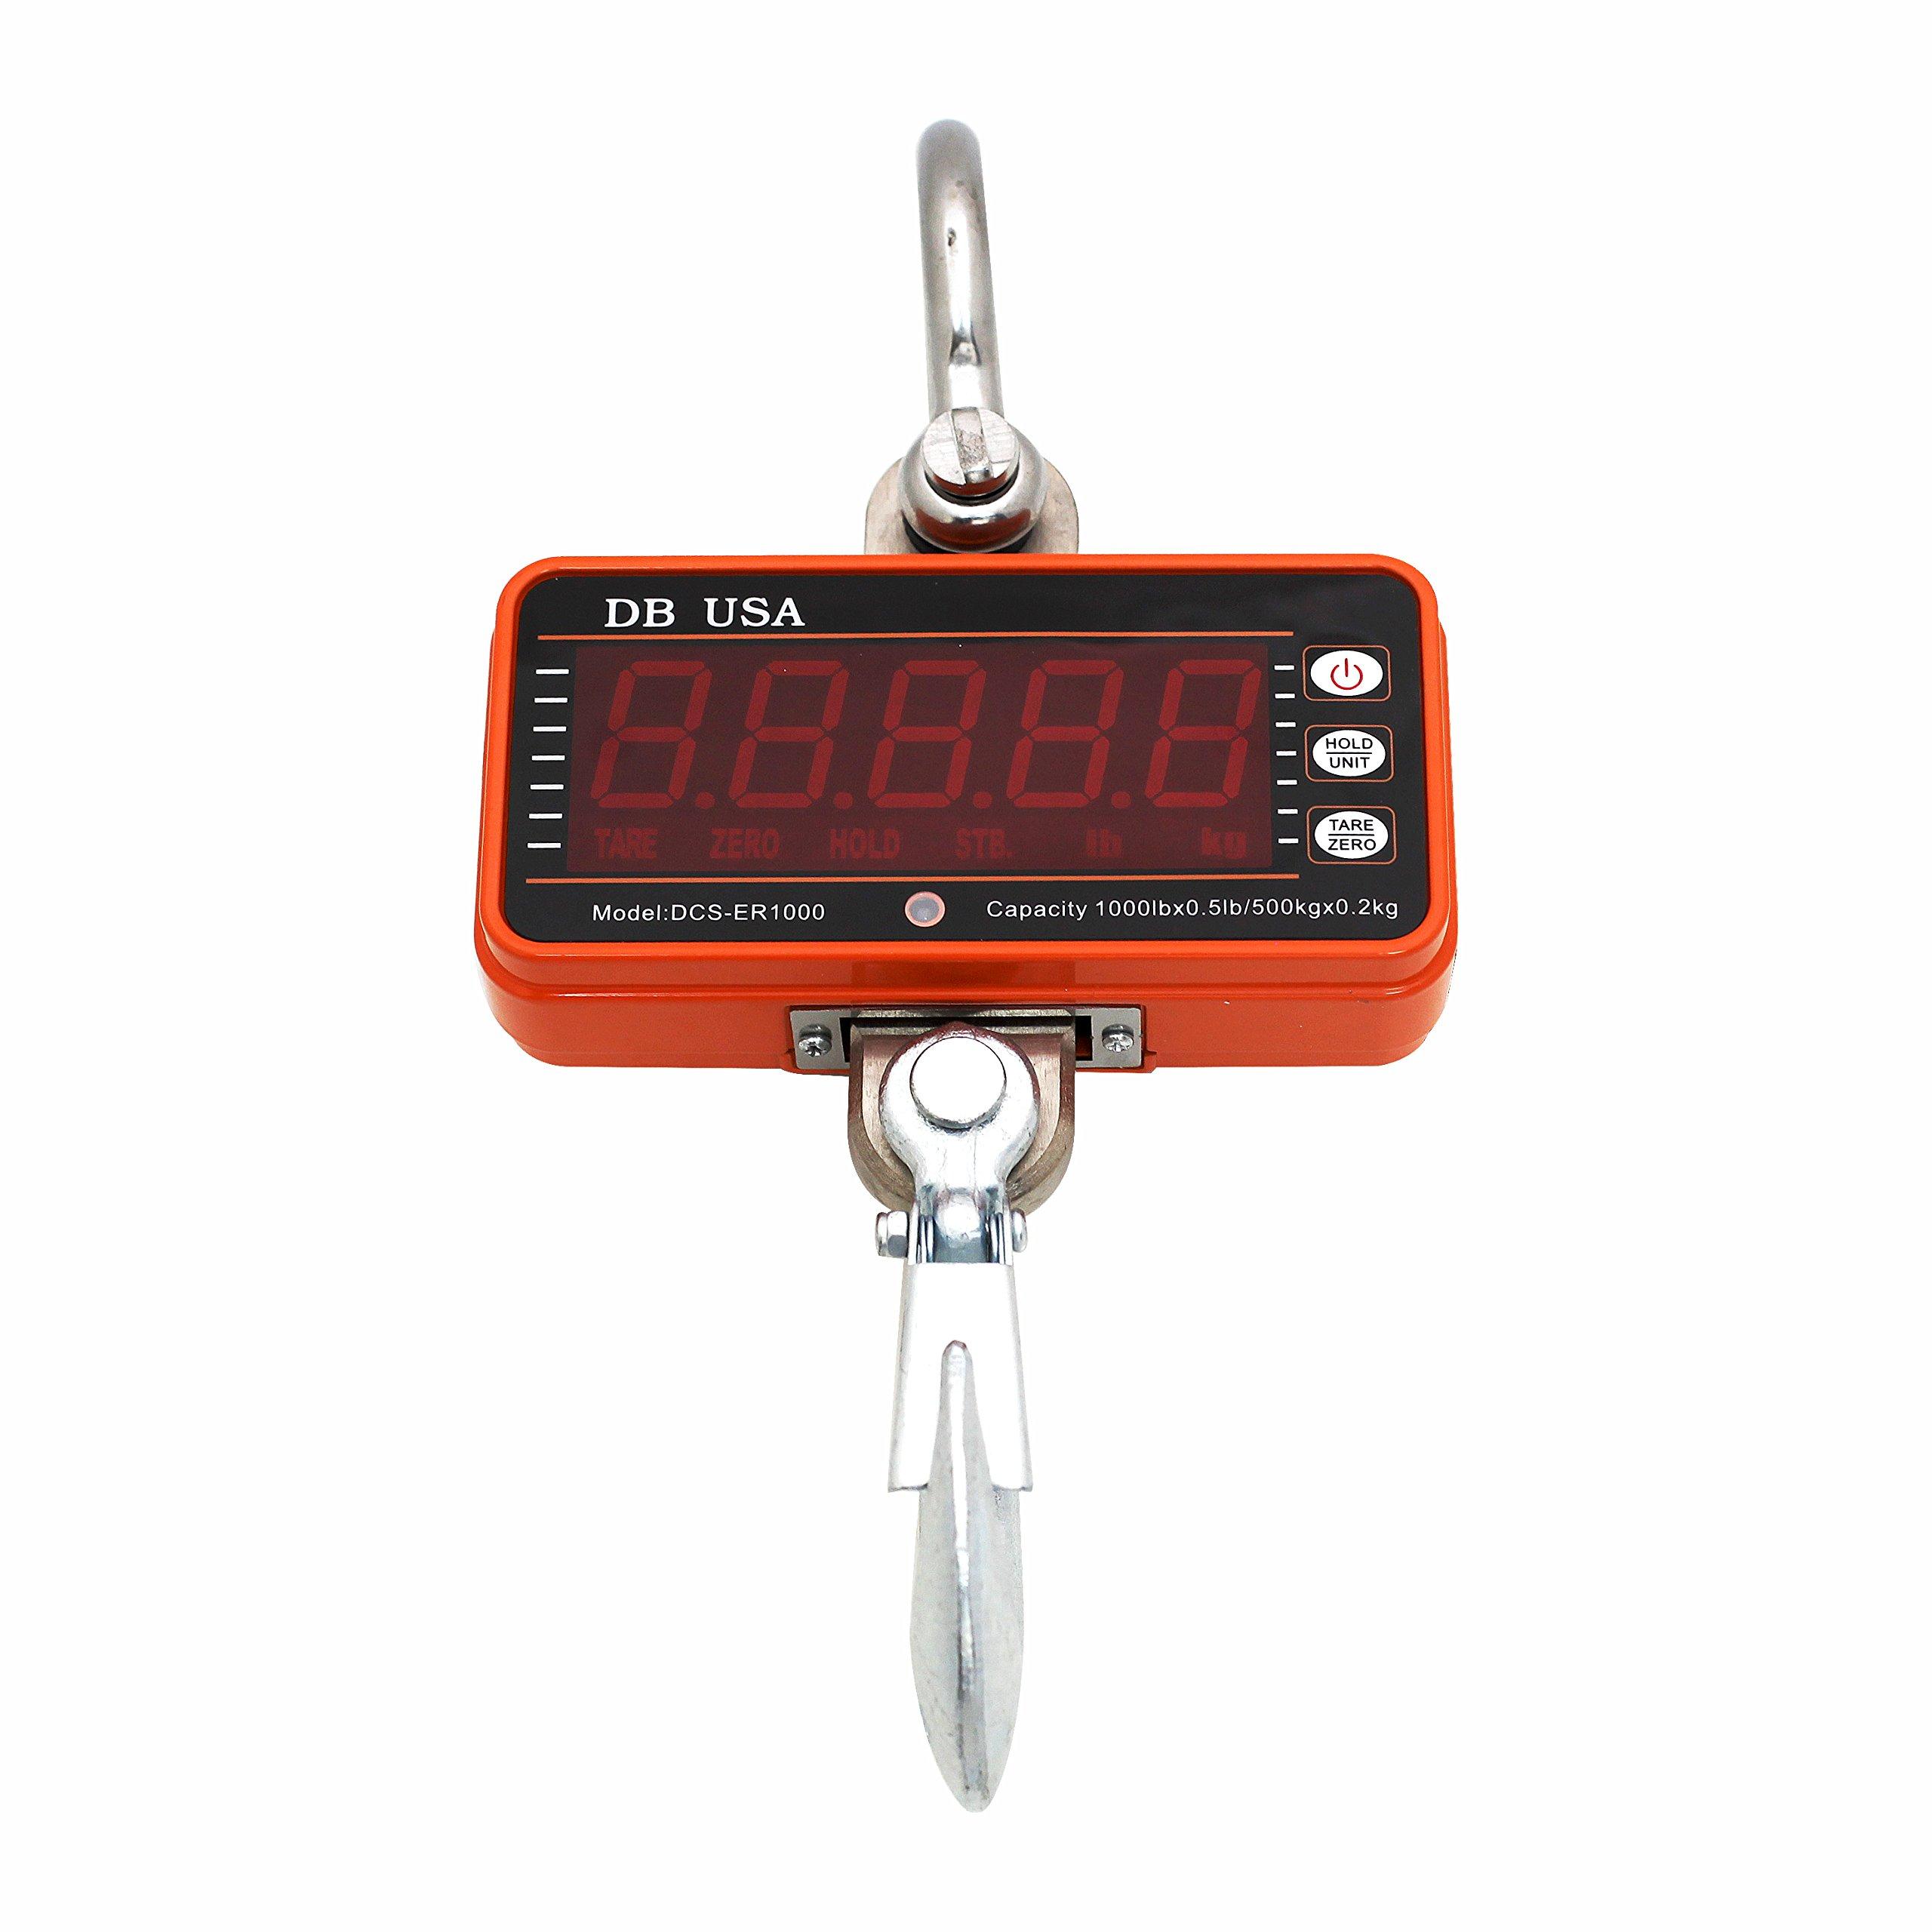 DB USA Digital Crane Scale, DCS-ER1000lb / 500kg High Precision Compact Hanging Scale LED Display